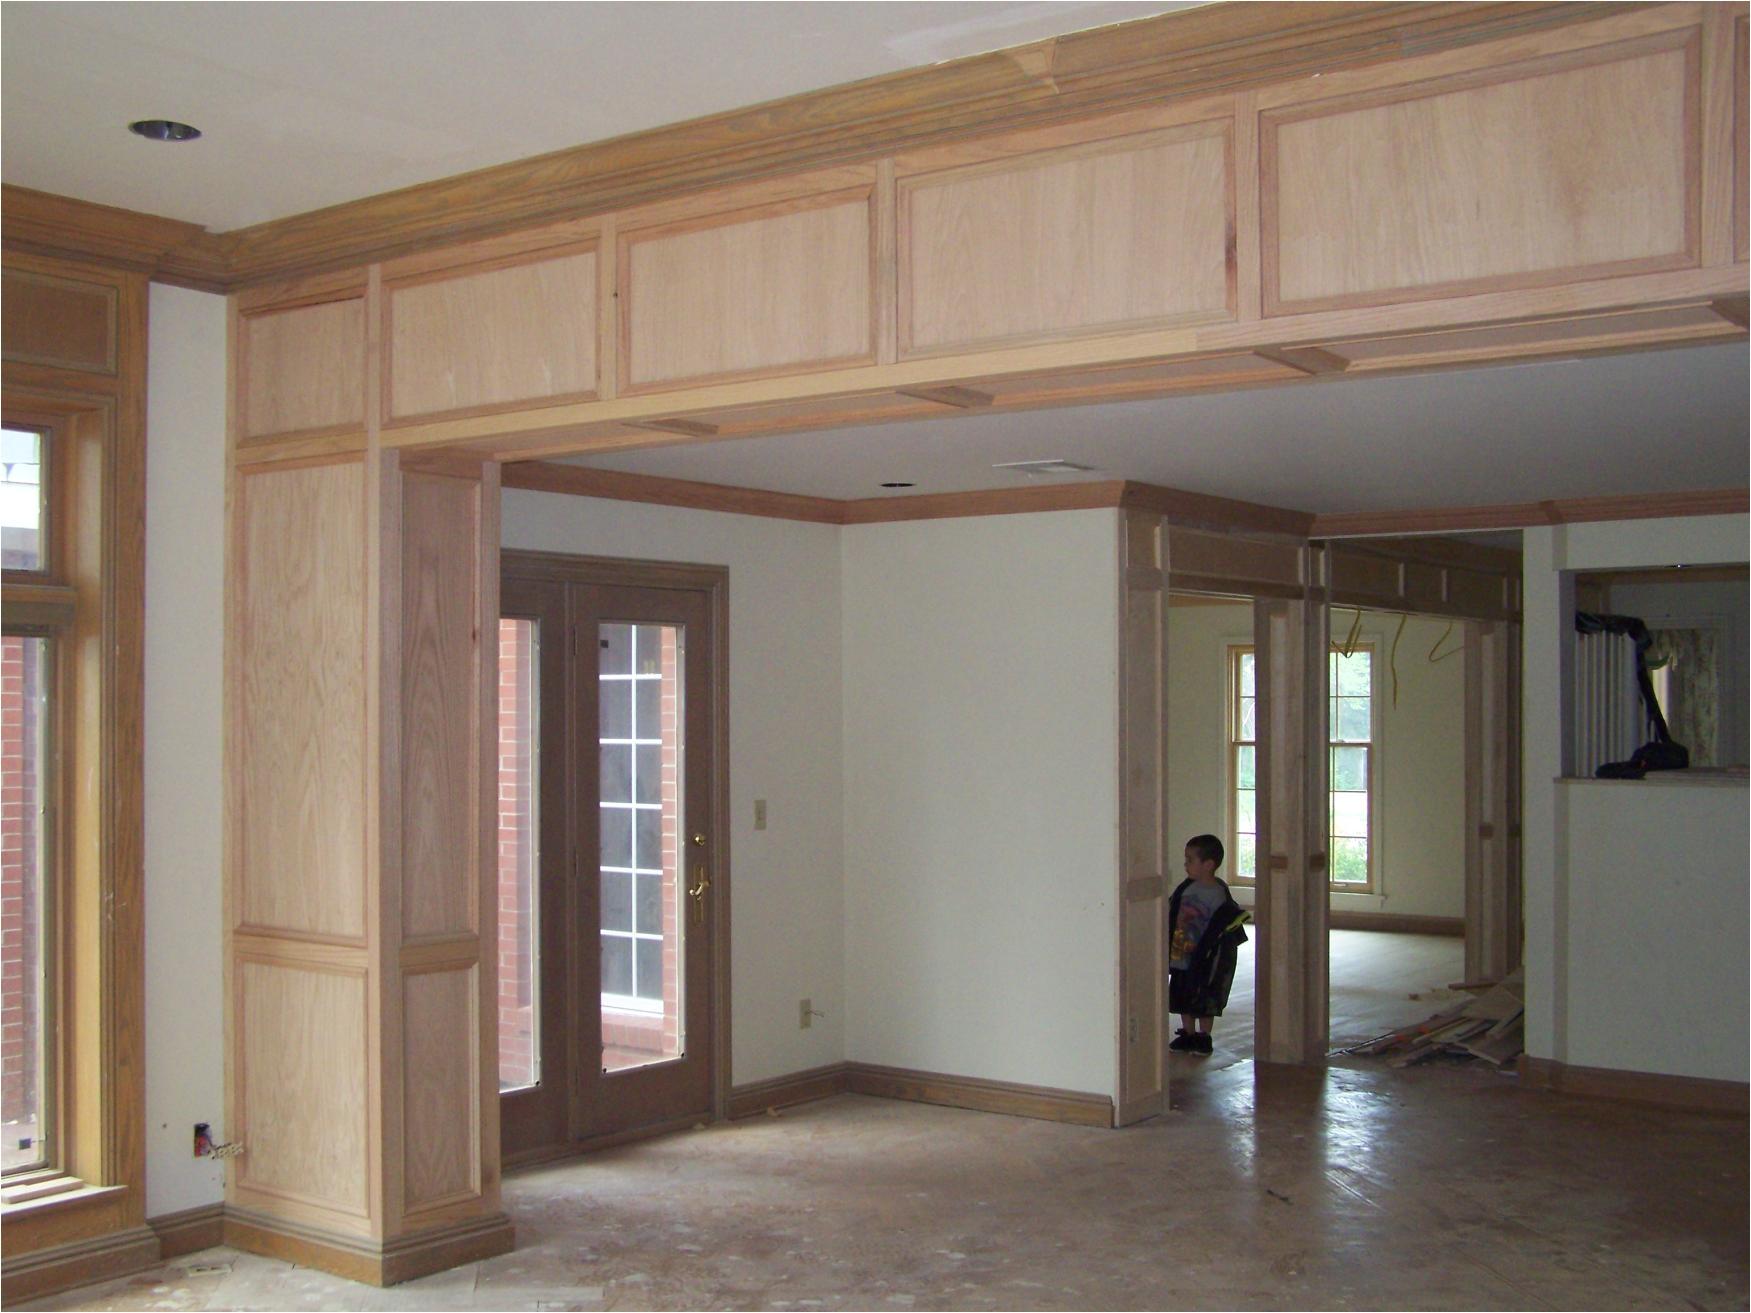 decorative basement column covers ideas berg san decor